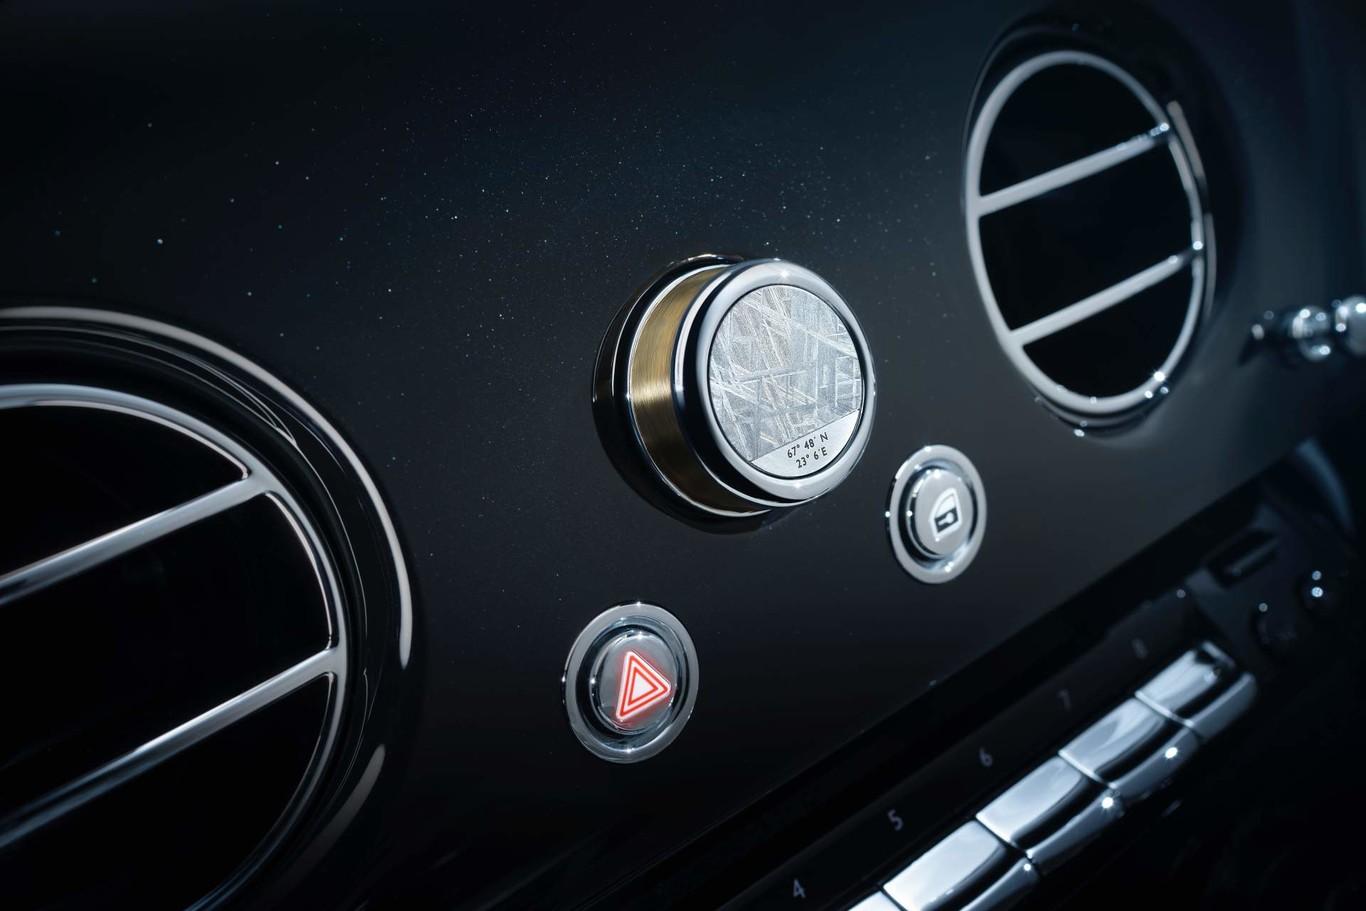 Rolls-Royce Phantom Tranquility 2019